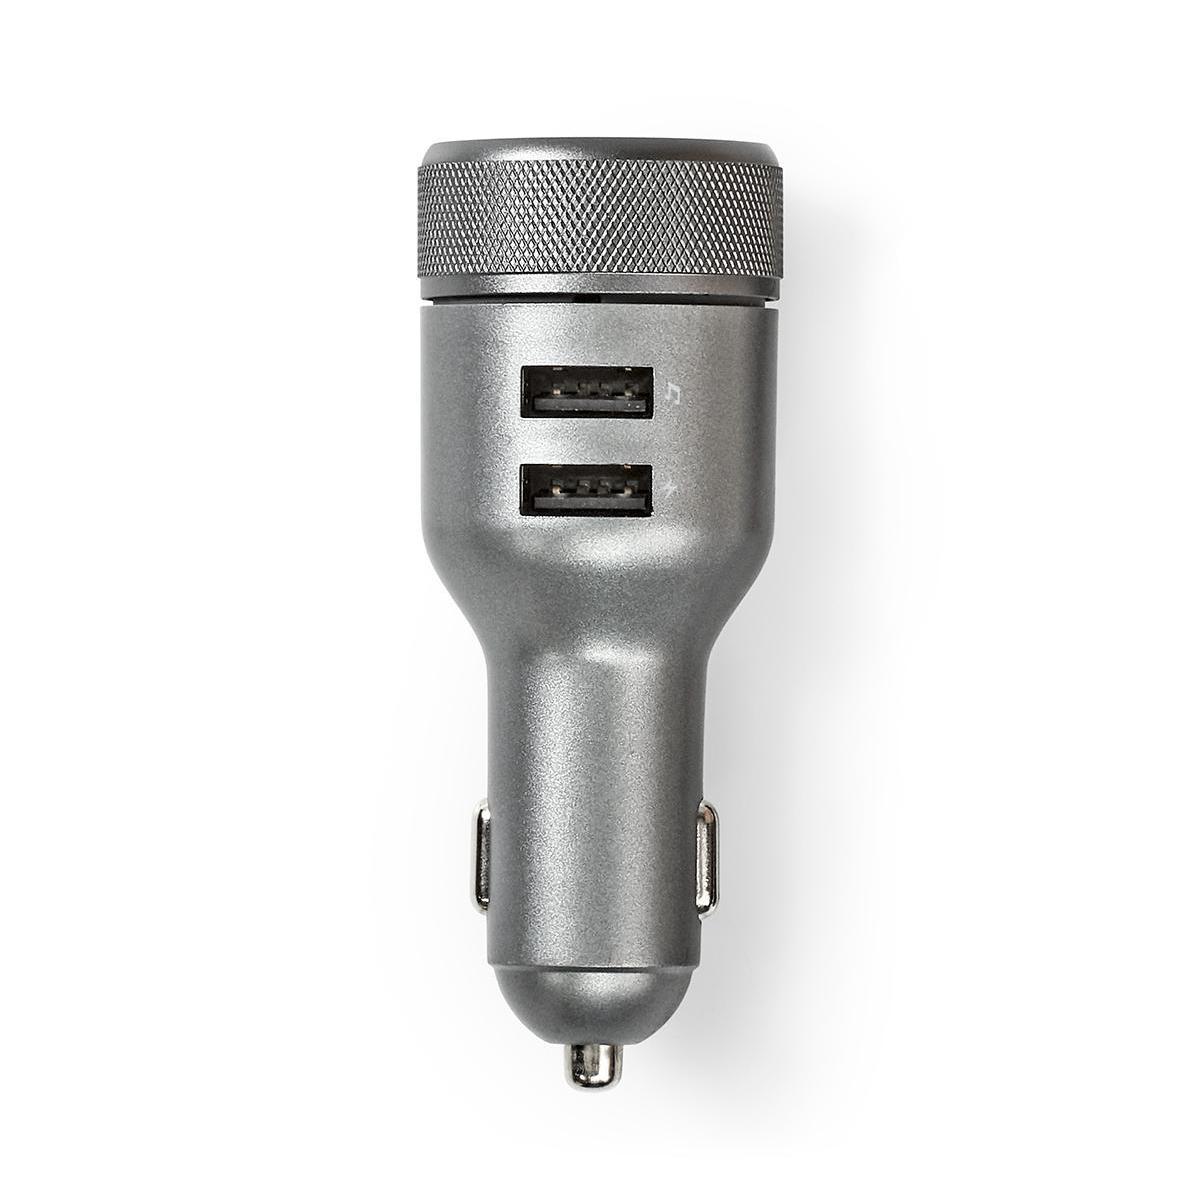 FM Sender For bil   Bluetooth®   Håndfrie Anrop   2 stk. USB